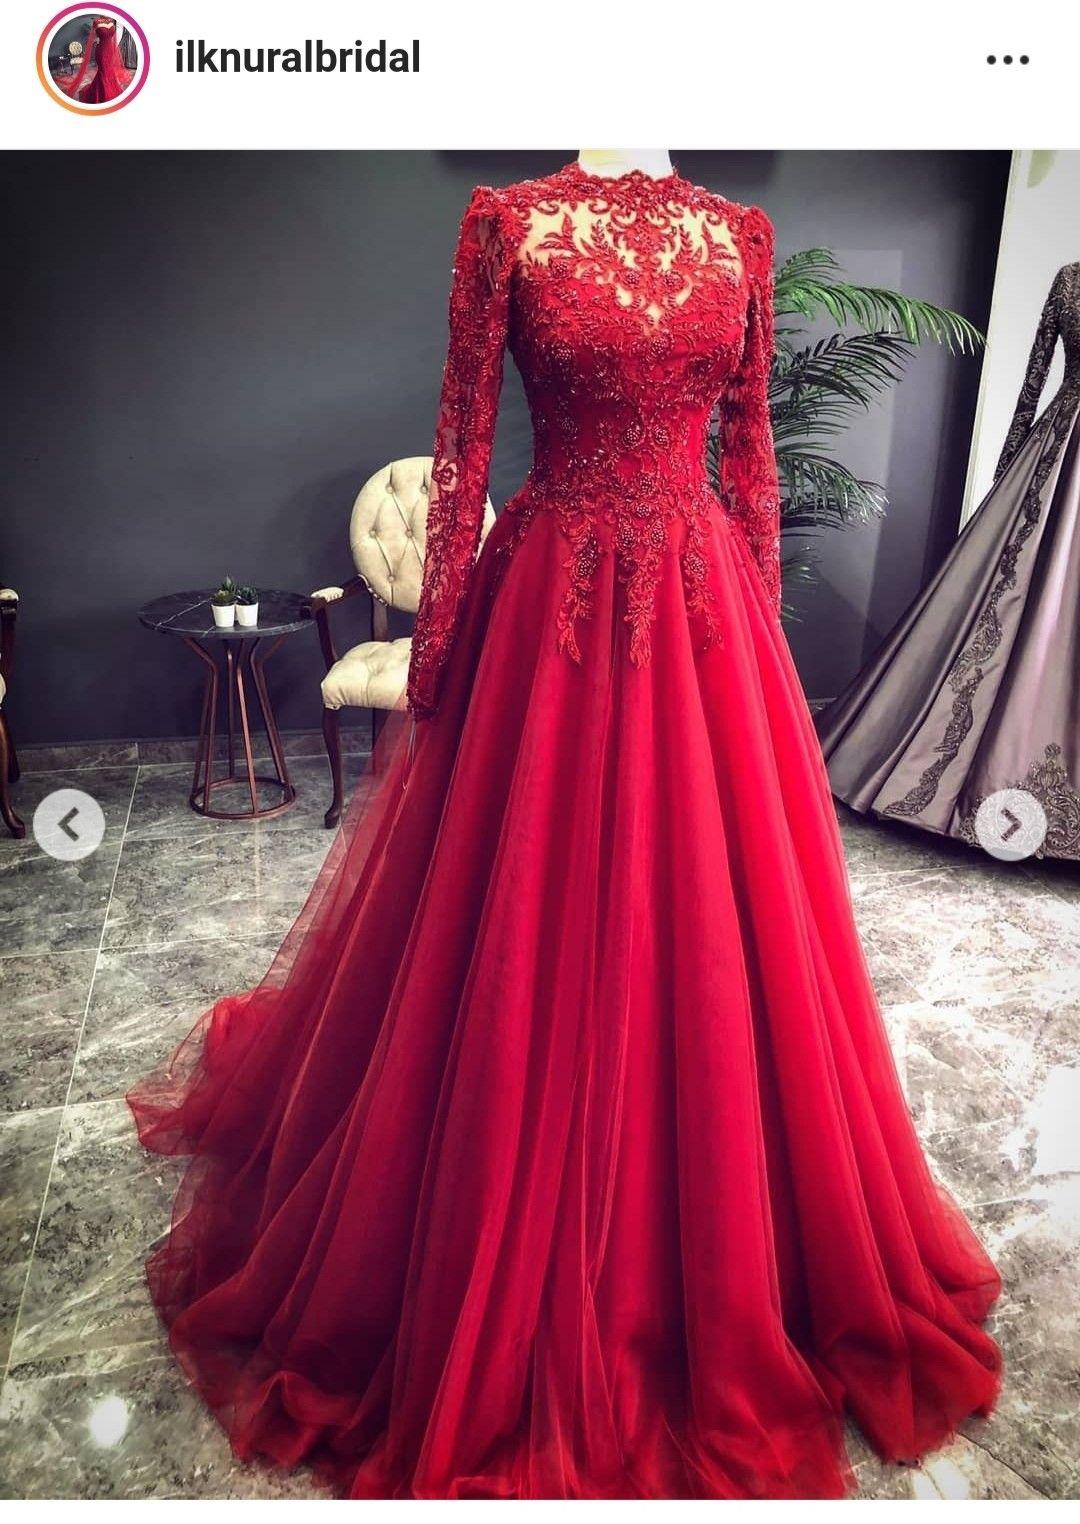 Pin By Nishat Farha On đầm Cưới 2019 Red Bridal Gown Tulle Prom Dress Red Wedding Dresses